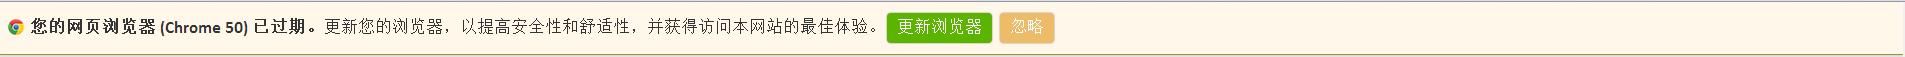 X-Browser-Update